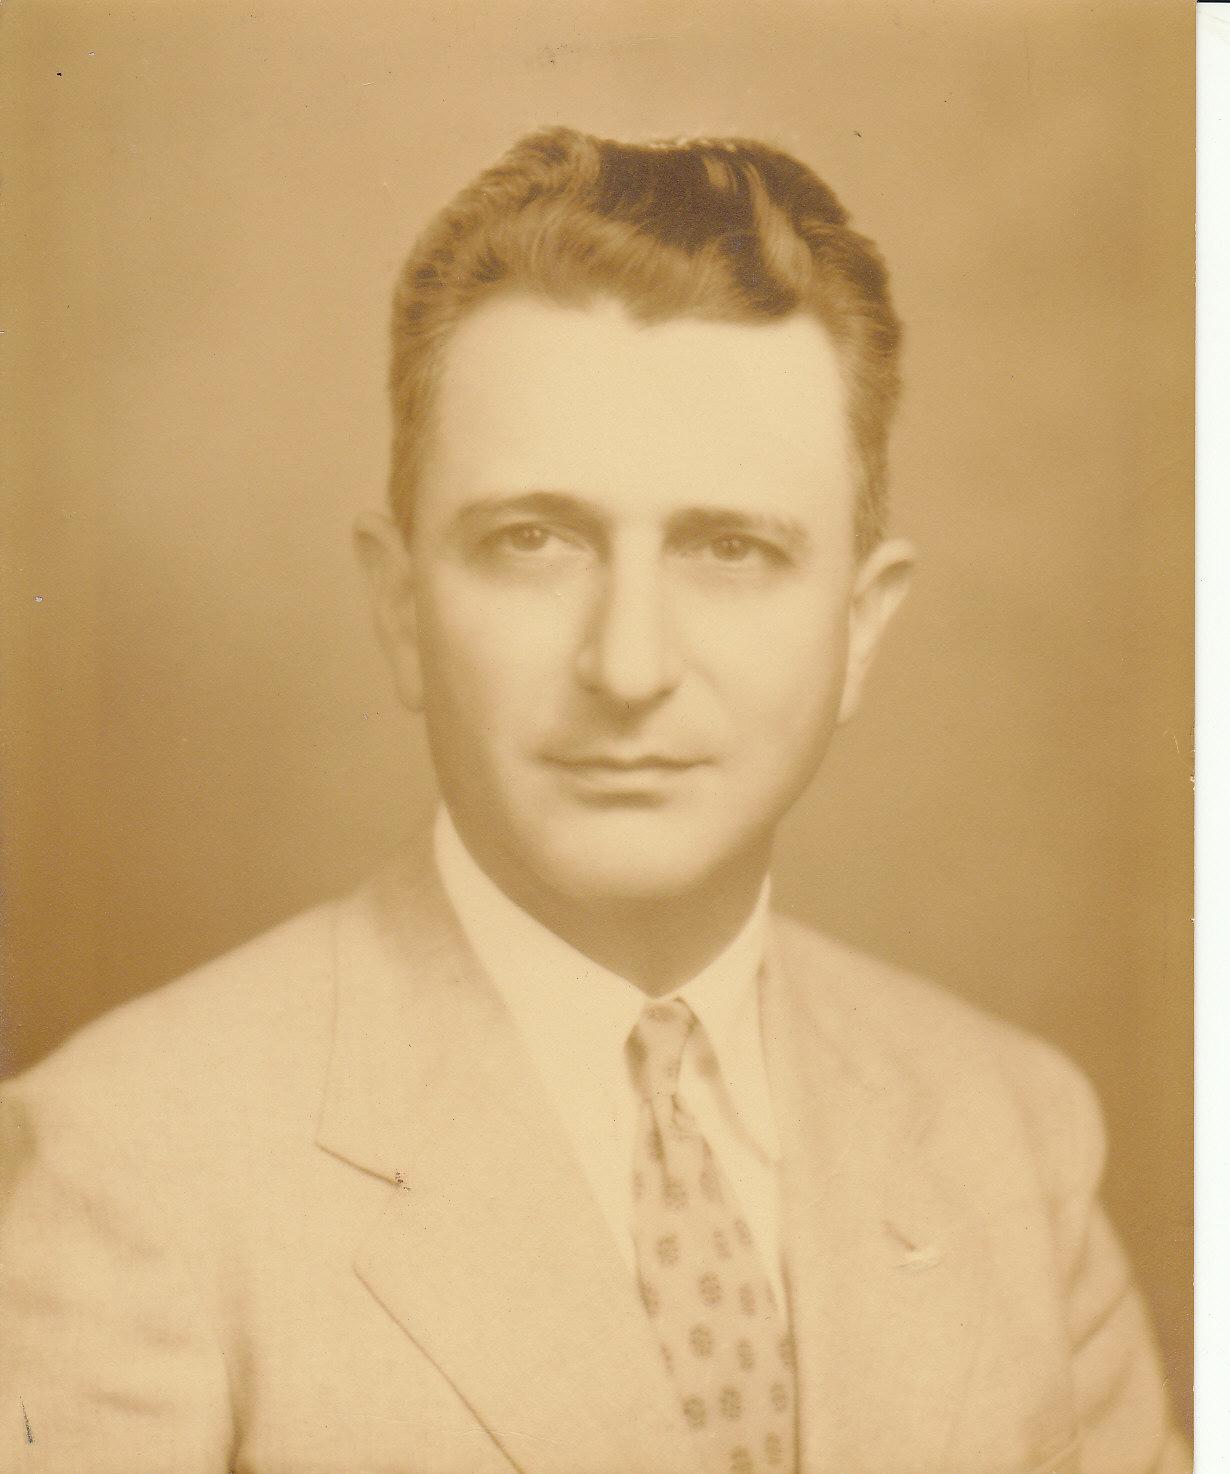 H. P. Donigan